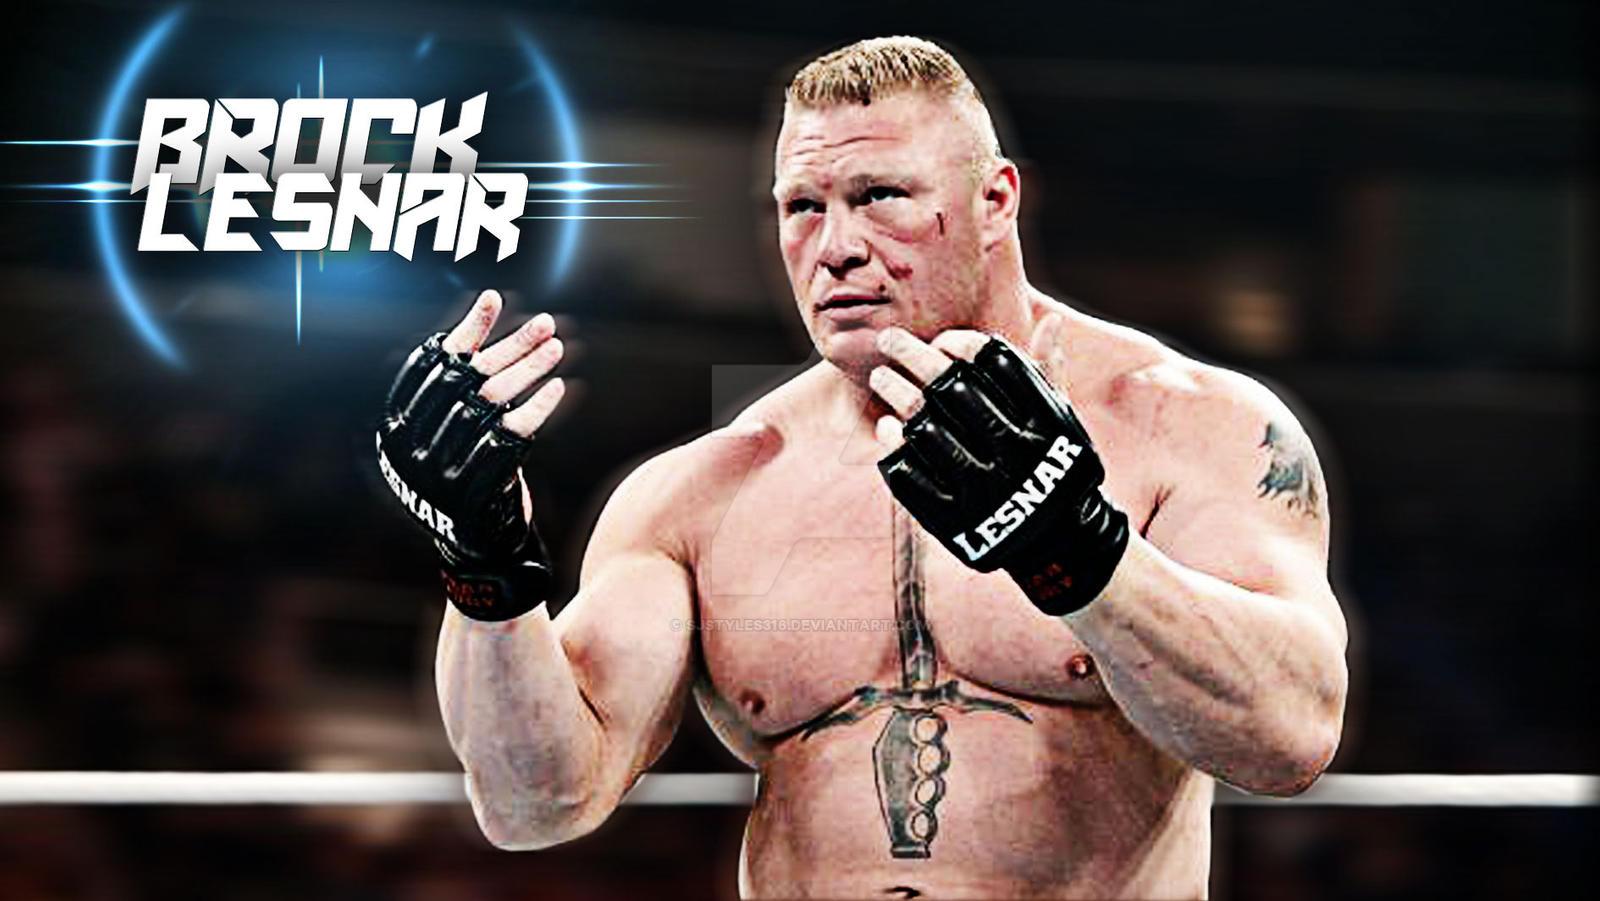 Brock Lesnar Wallpaper By Sj Sjstyles316